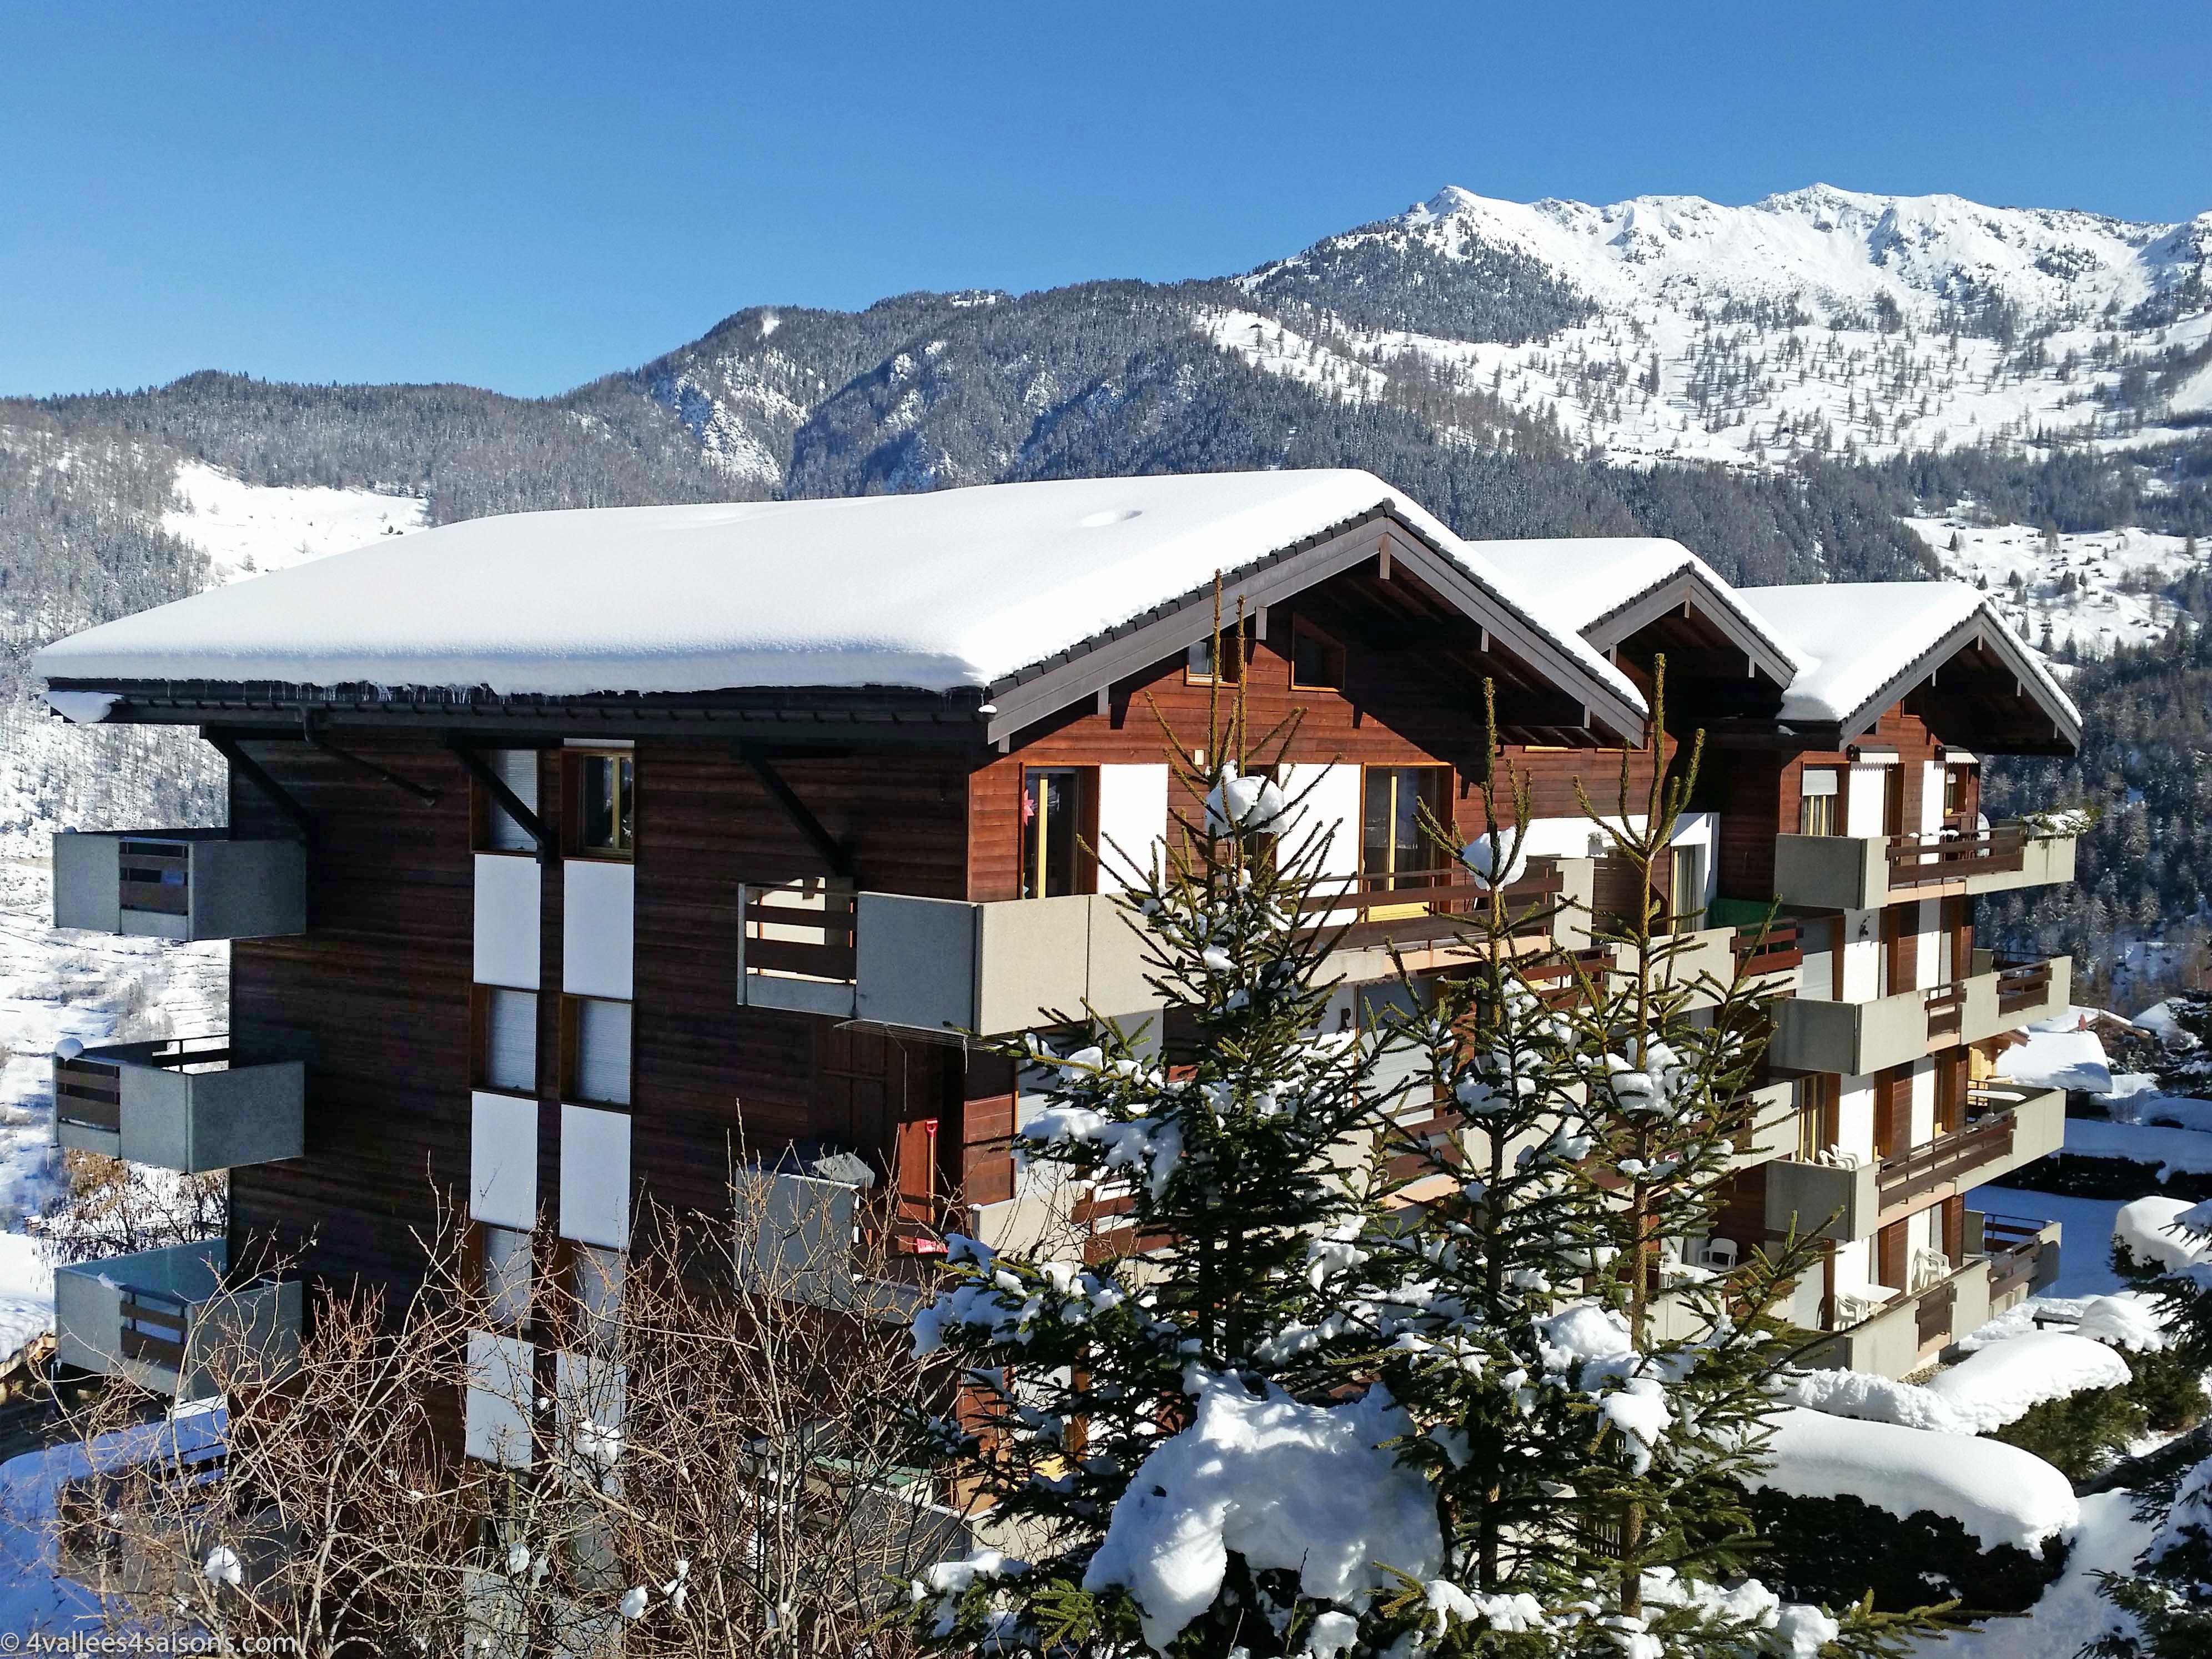 Appartement Nevada II/Apt 405 in La Tzoumaz, Zwitserland CH1914 ...